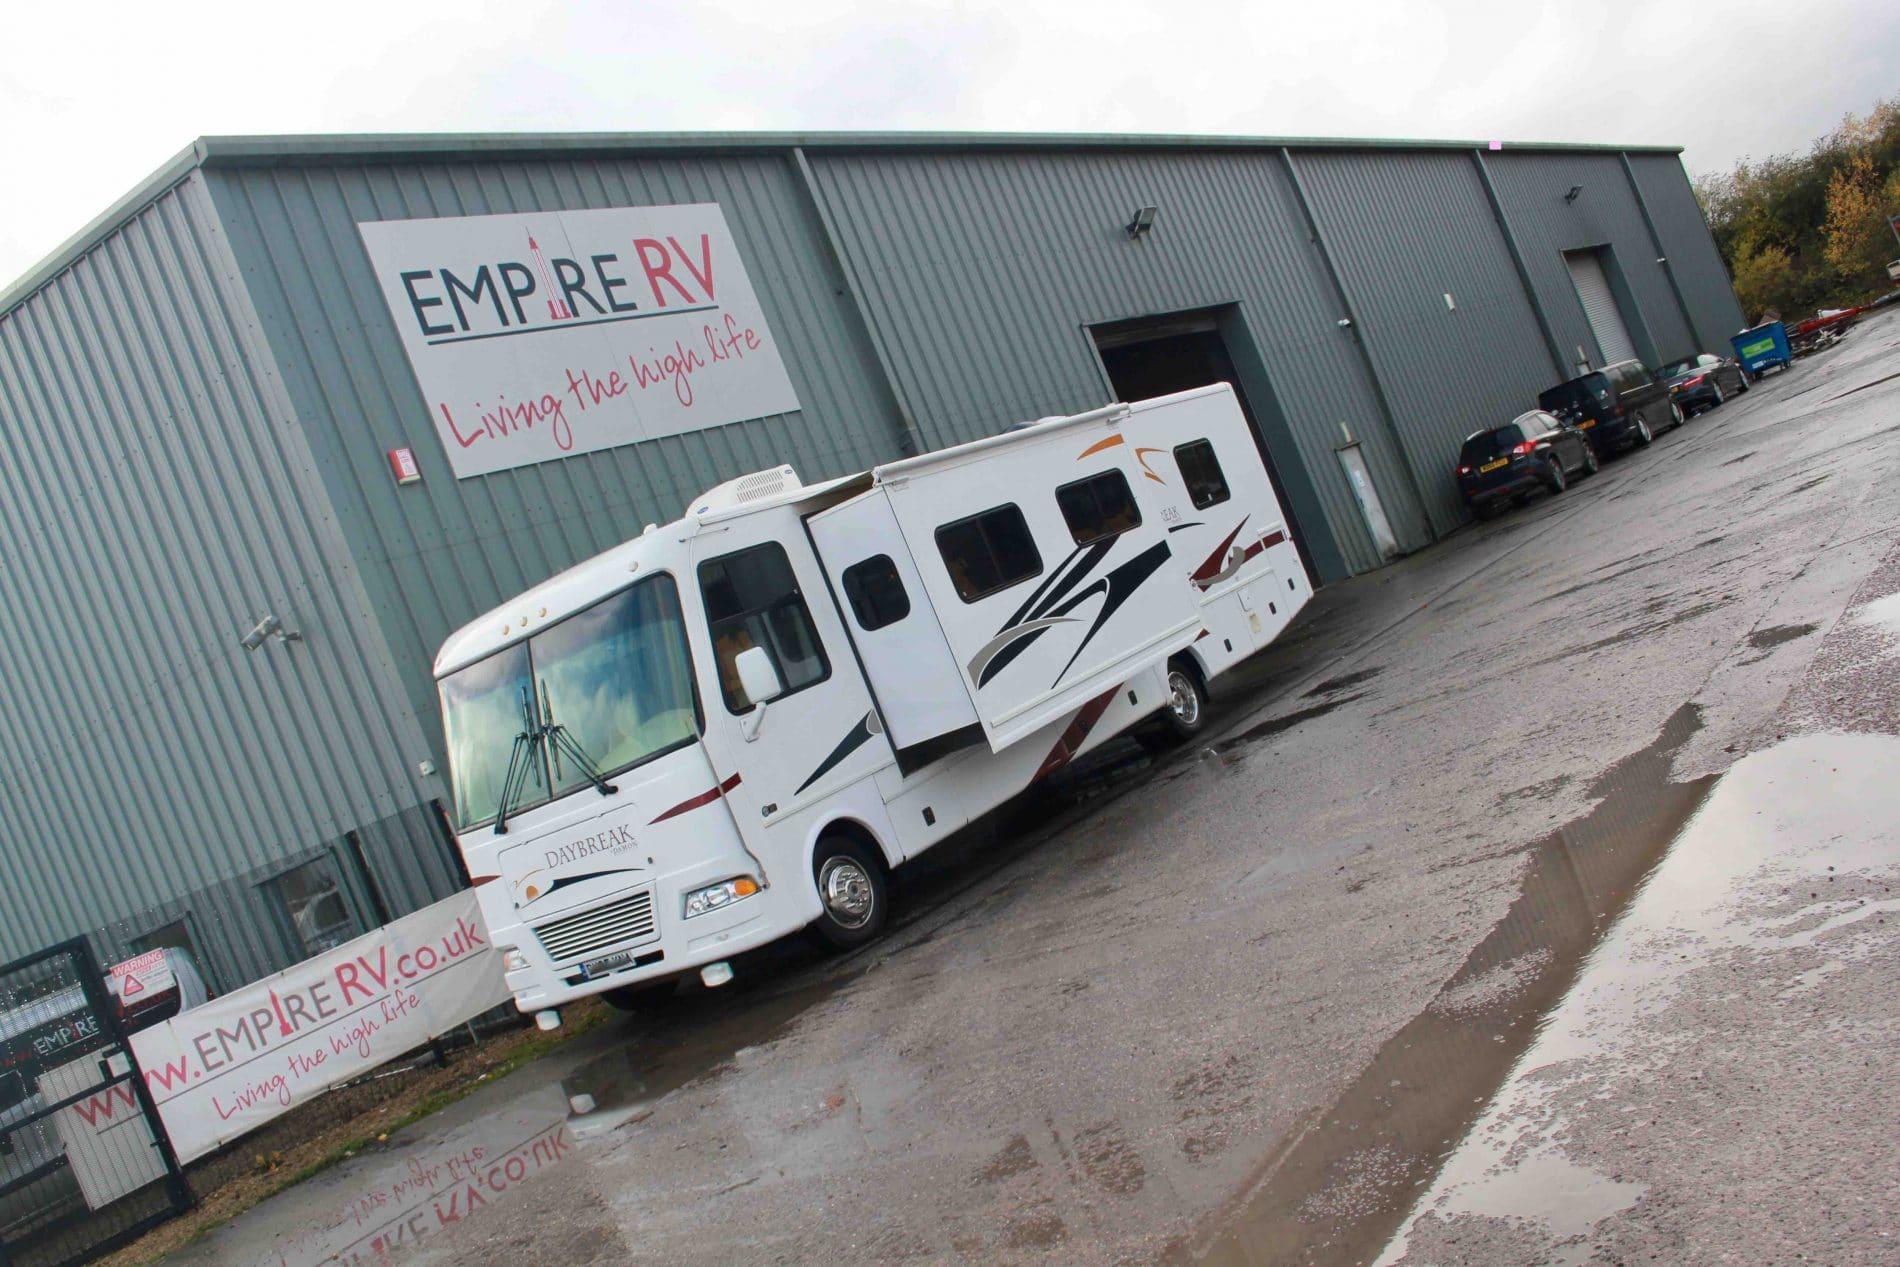 Damon Daybreak 3270 Motorhomes for sale rent – (c) Empire RV (19)